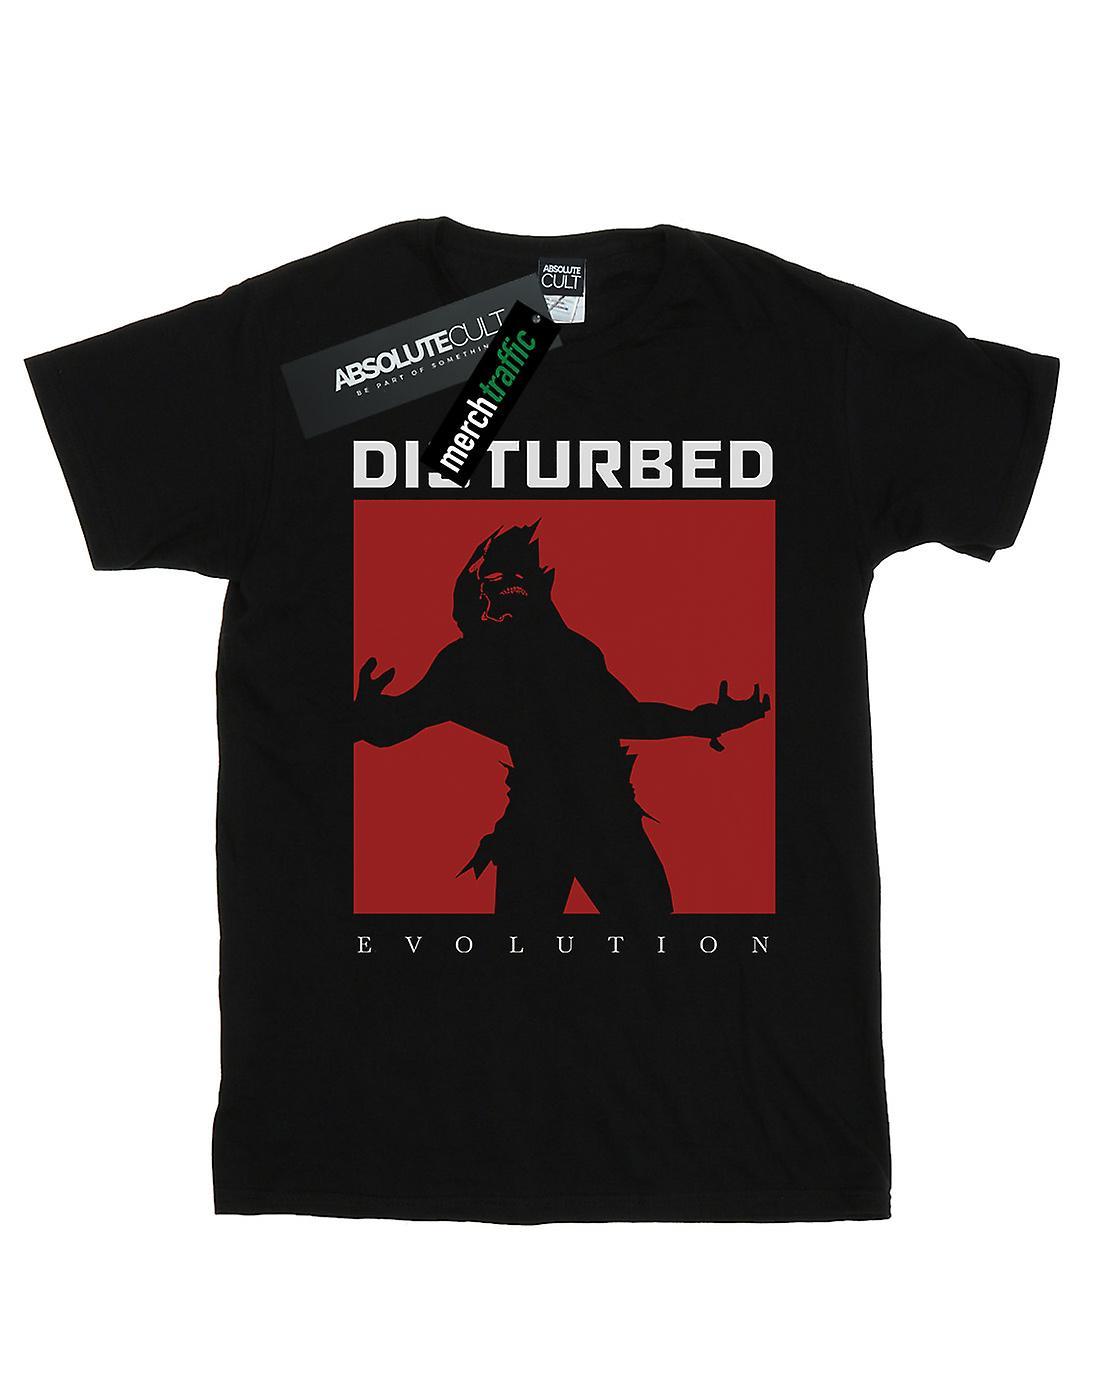 Disturbed Women's Evolution Square Boyfriend Fit T-Shirt